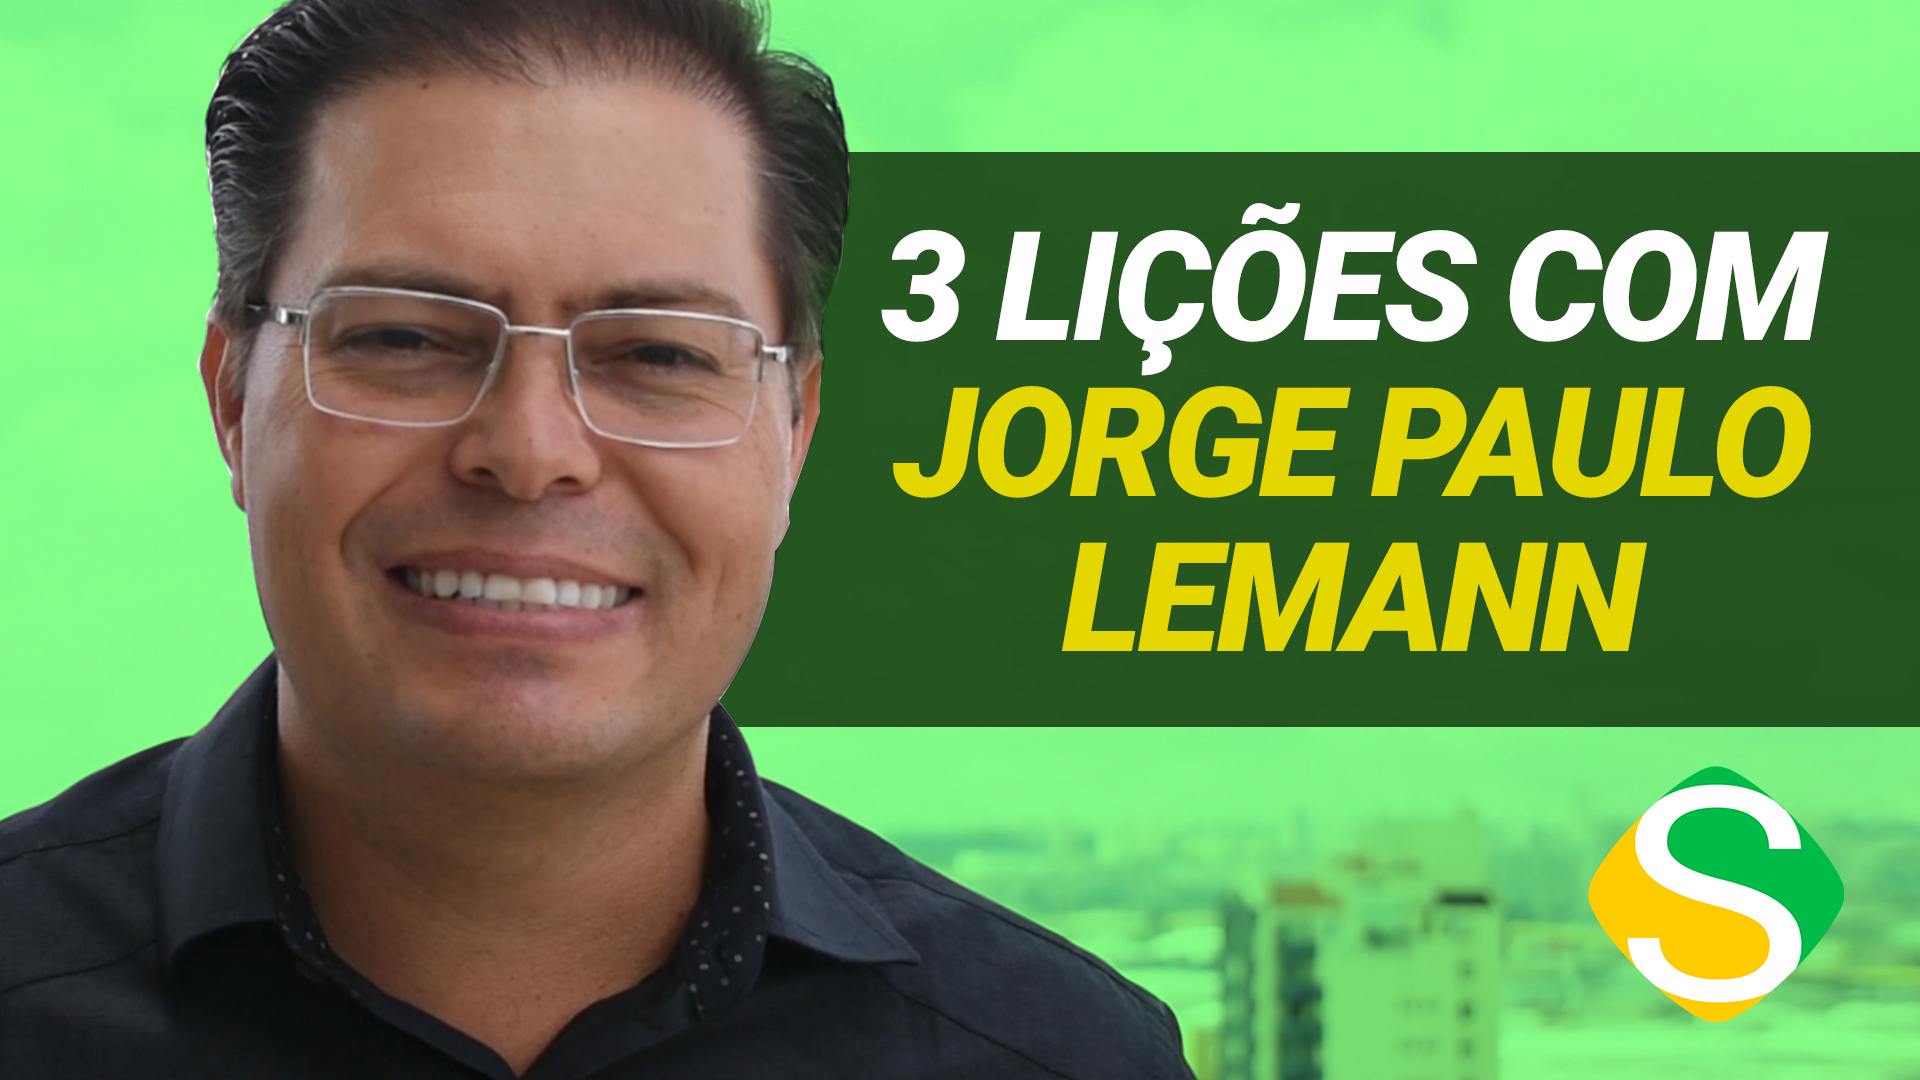 lições que aprendi com Jorge Paulo Lemann!